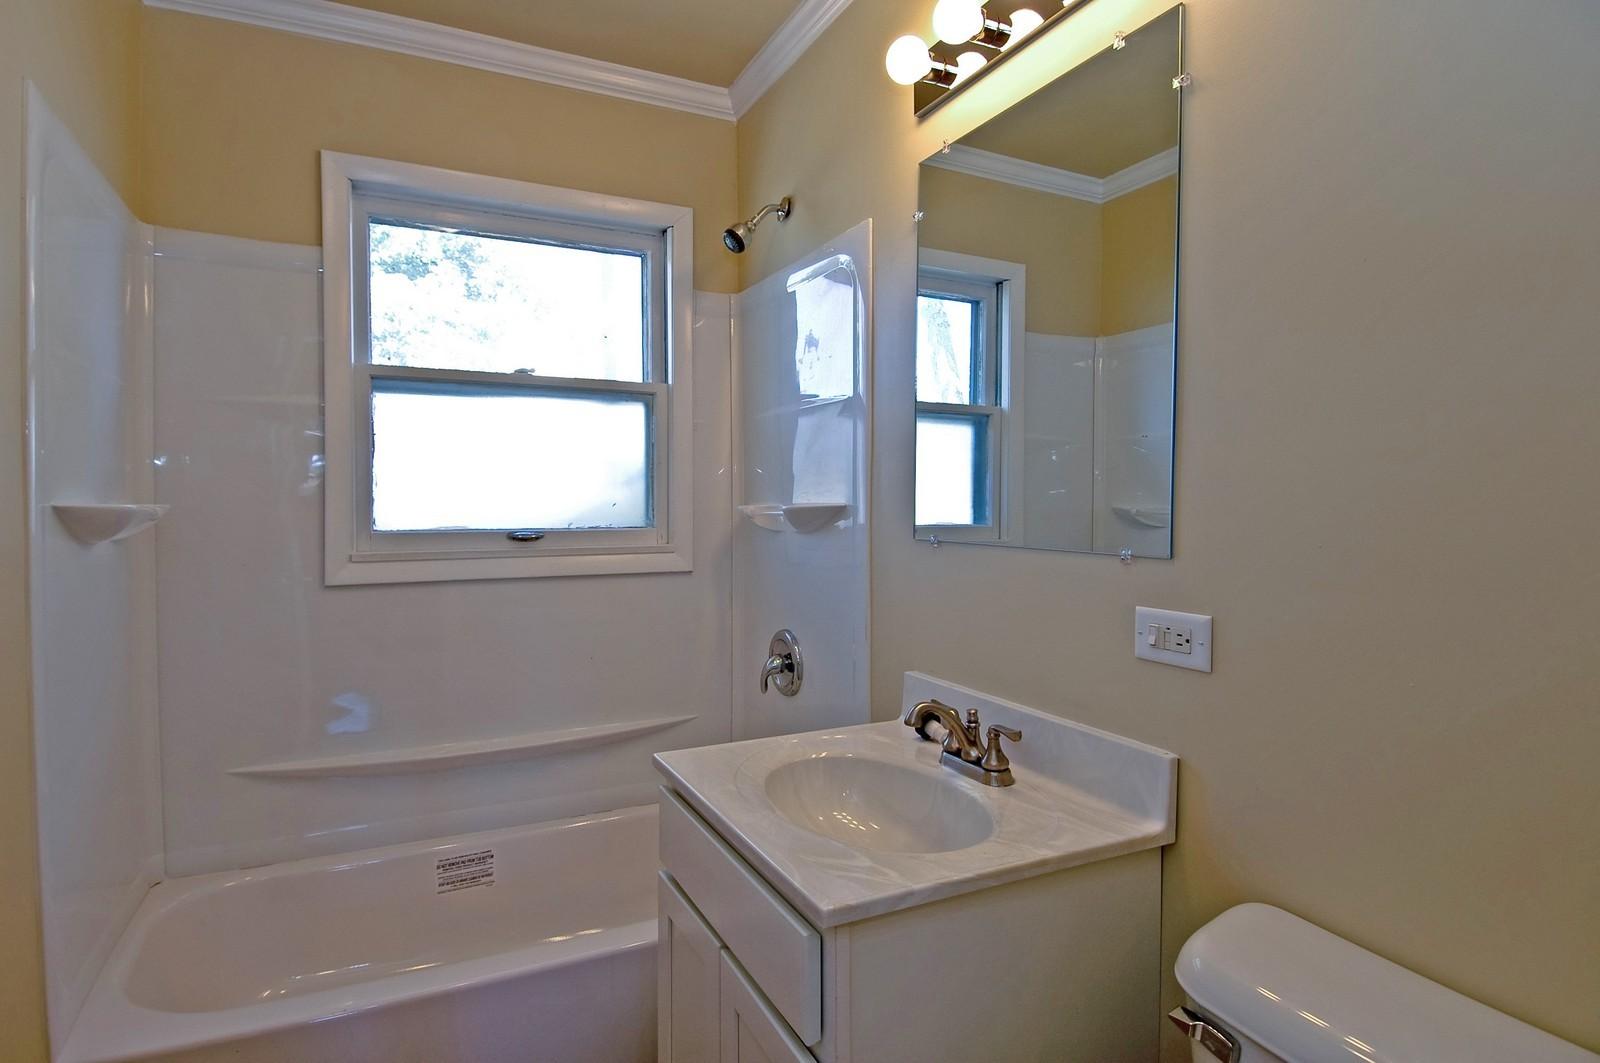 Real Estate Photography - 35W714 Crispin Dr, Elgin, IL, 60123 - Bathroom